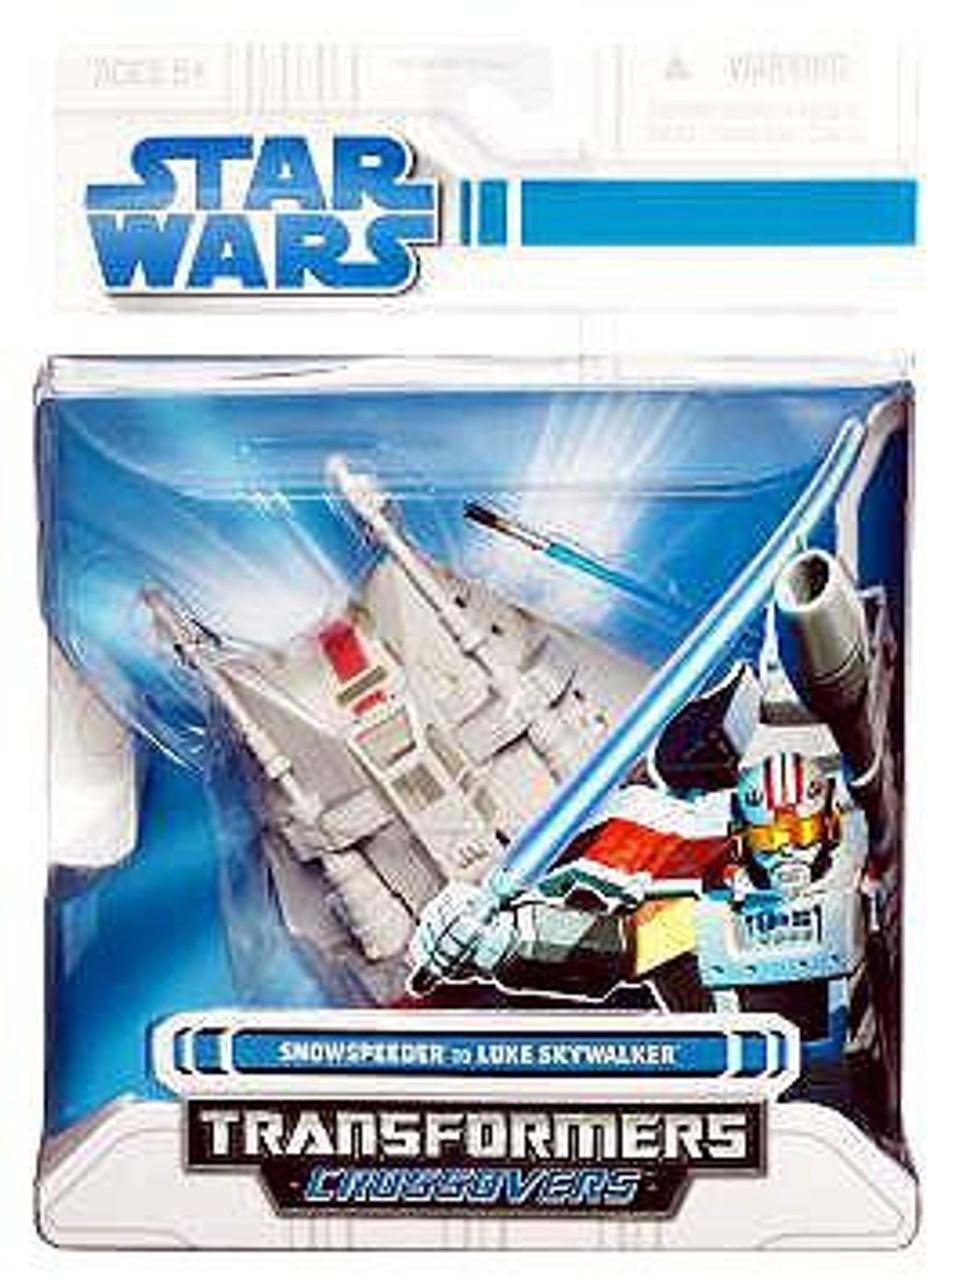 Star Wars Empire Strikes Back Transformers Crossovers 2008 Snowspeeder to Luke Skywalker Action Figure